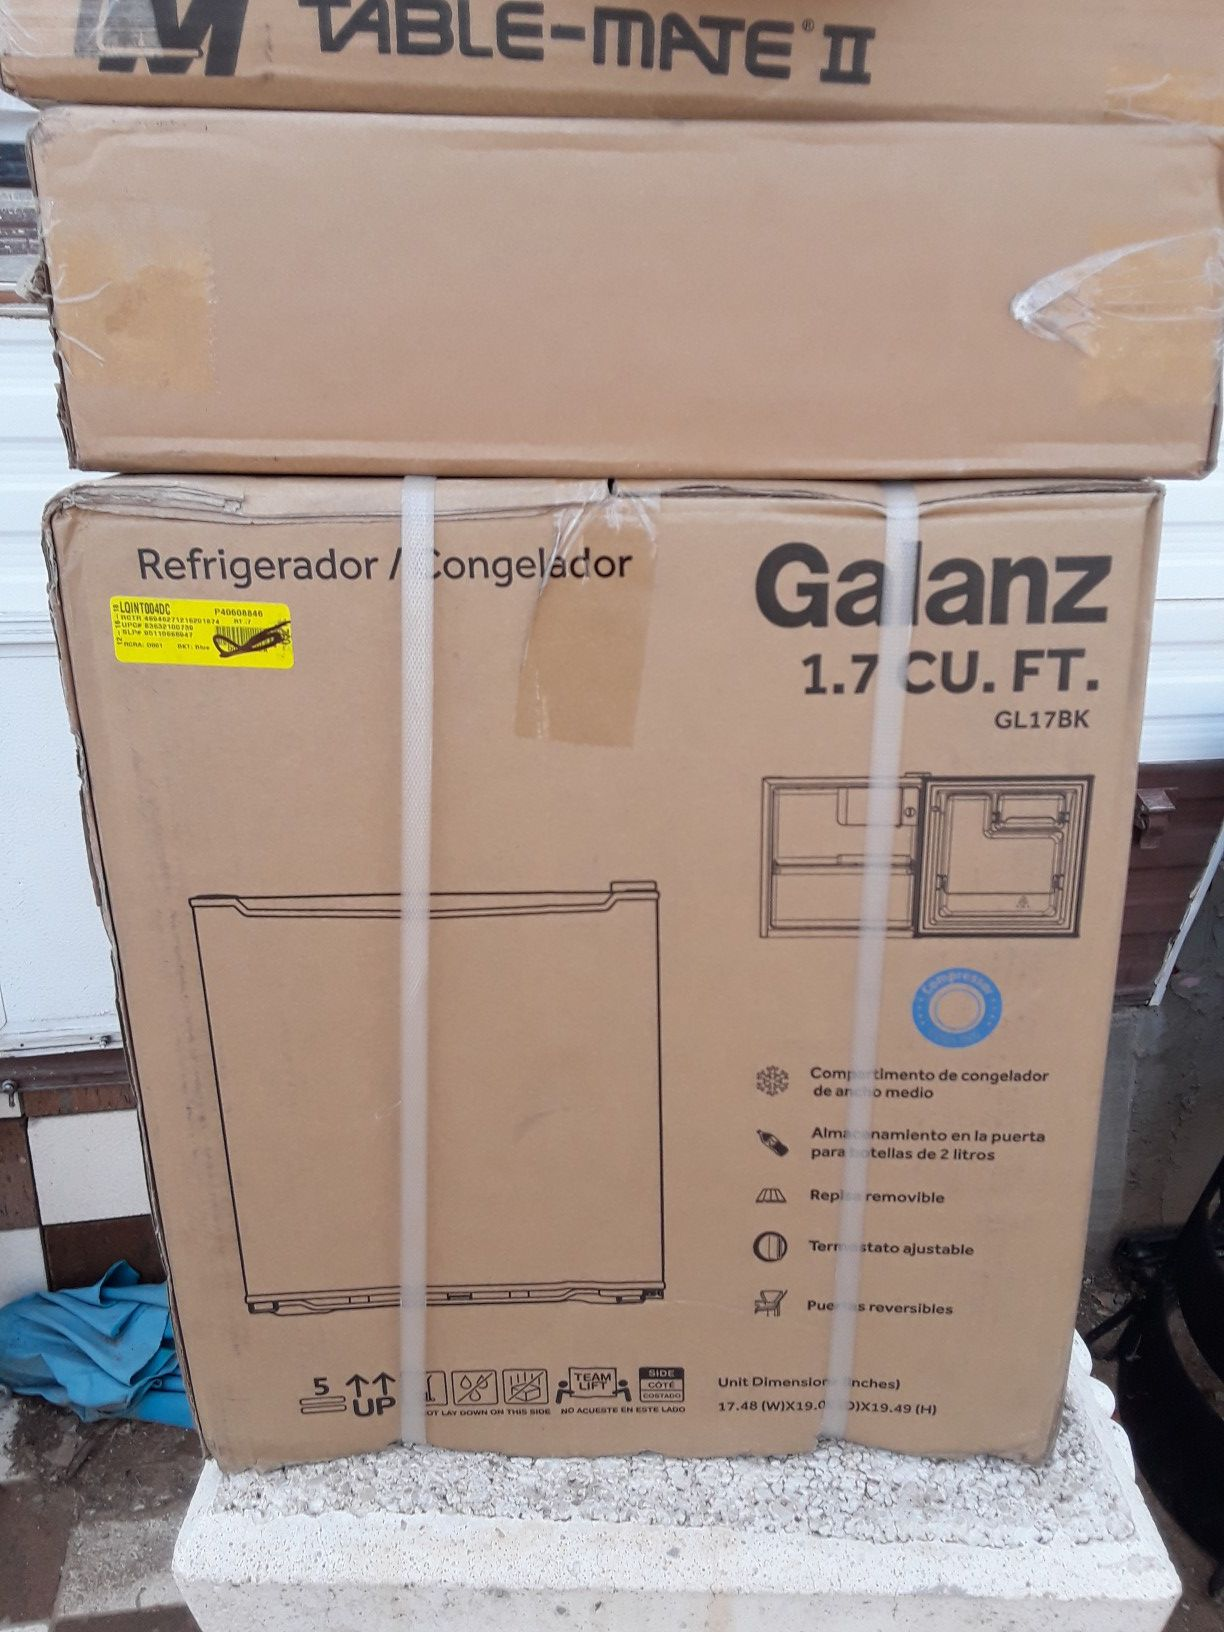 Galanz mini fridge 1.7 cf